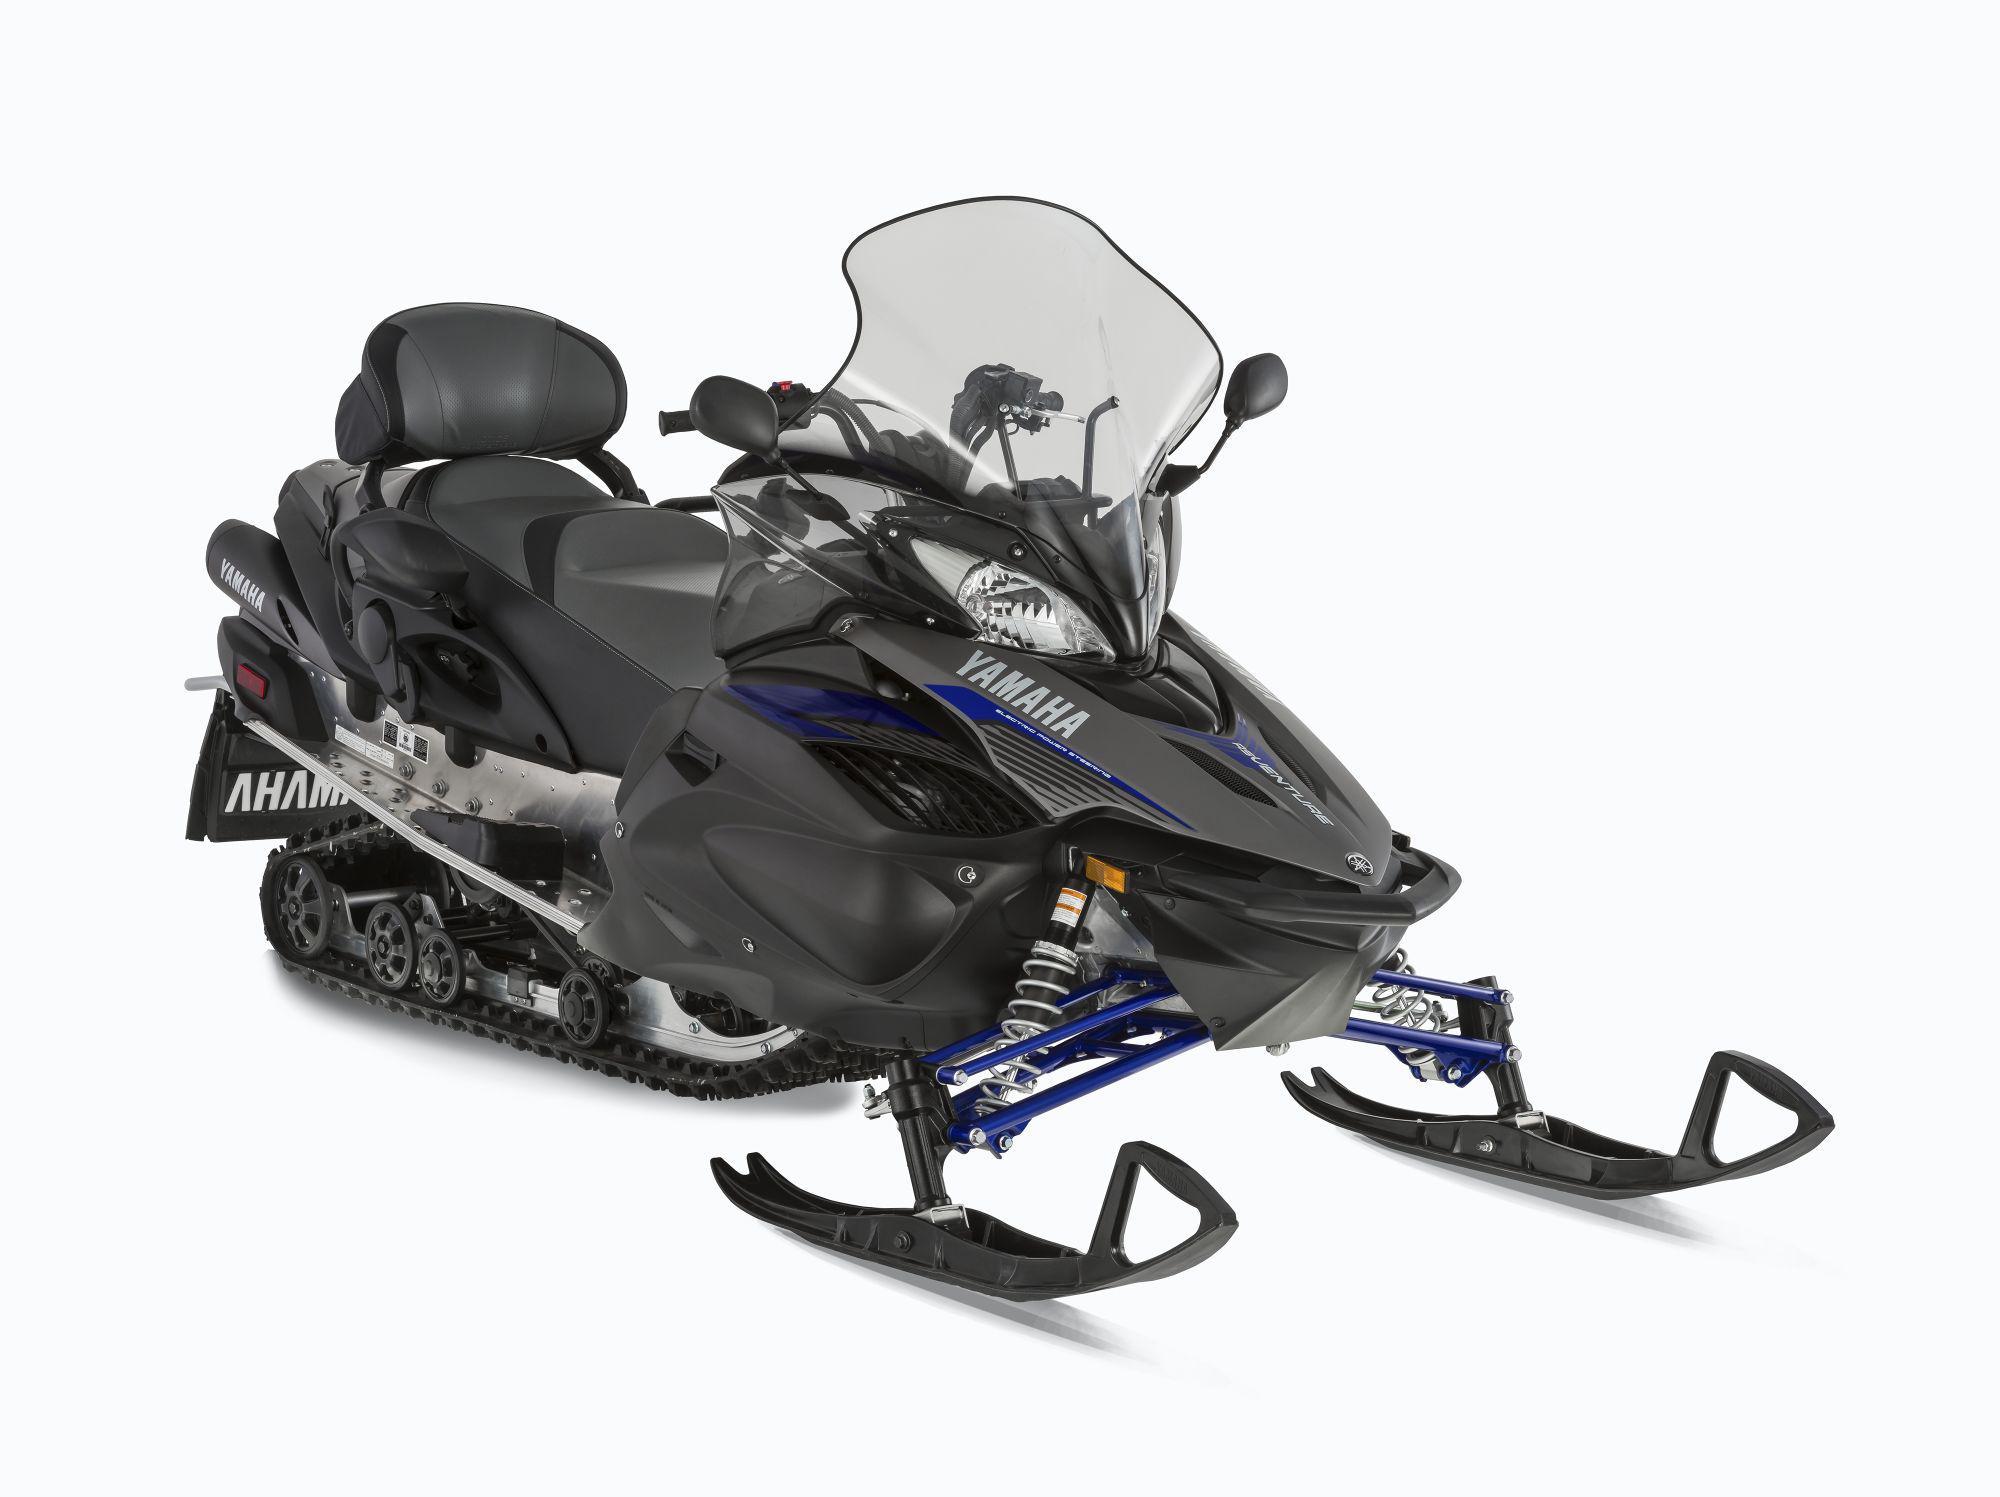 Motorrad Bild Jahrgang Yamaha